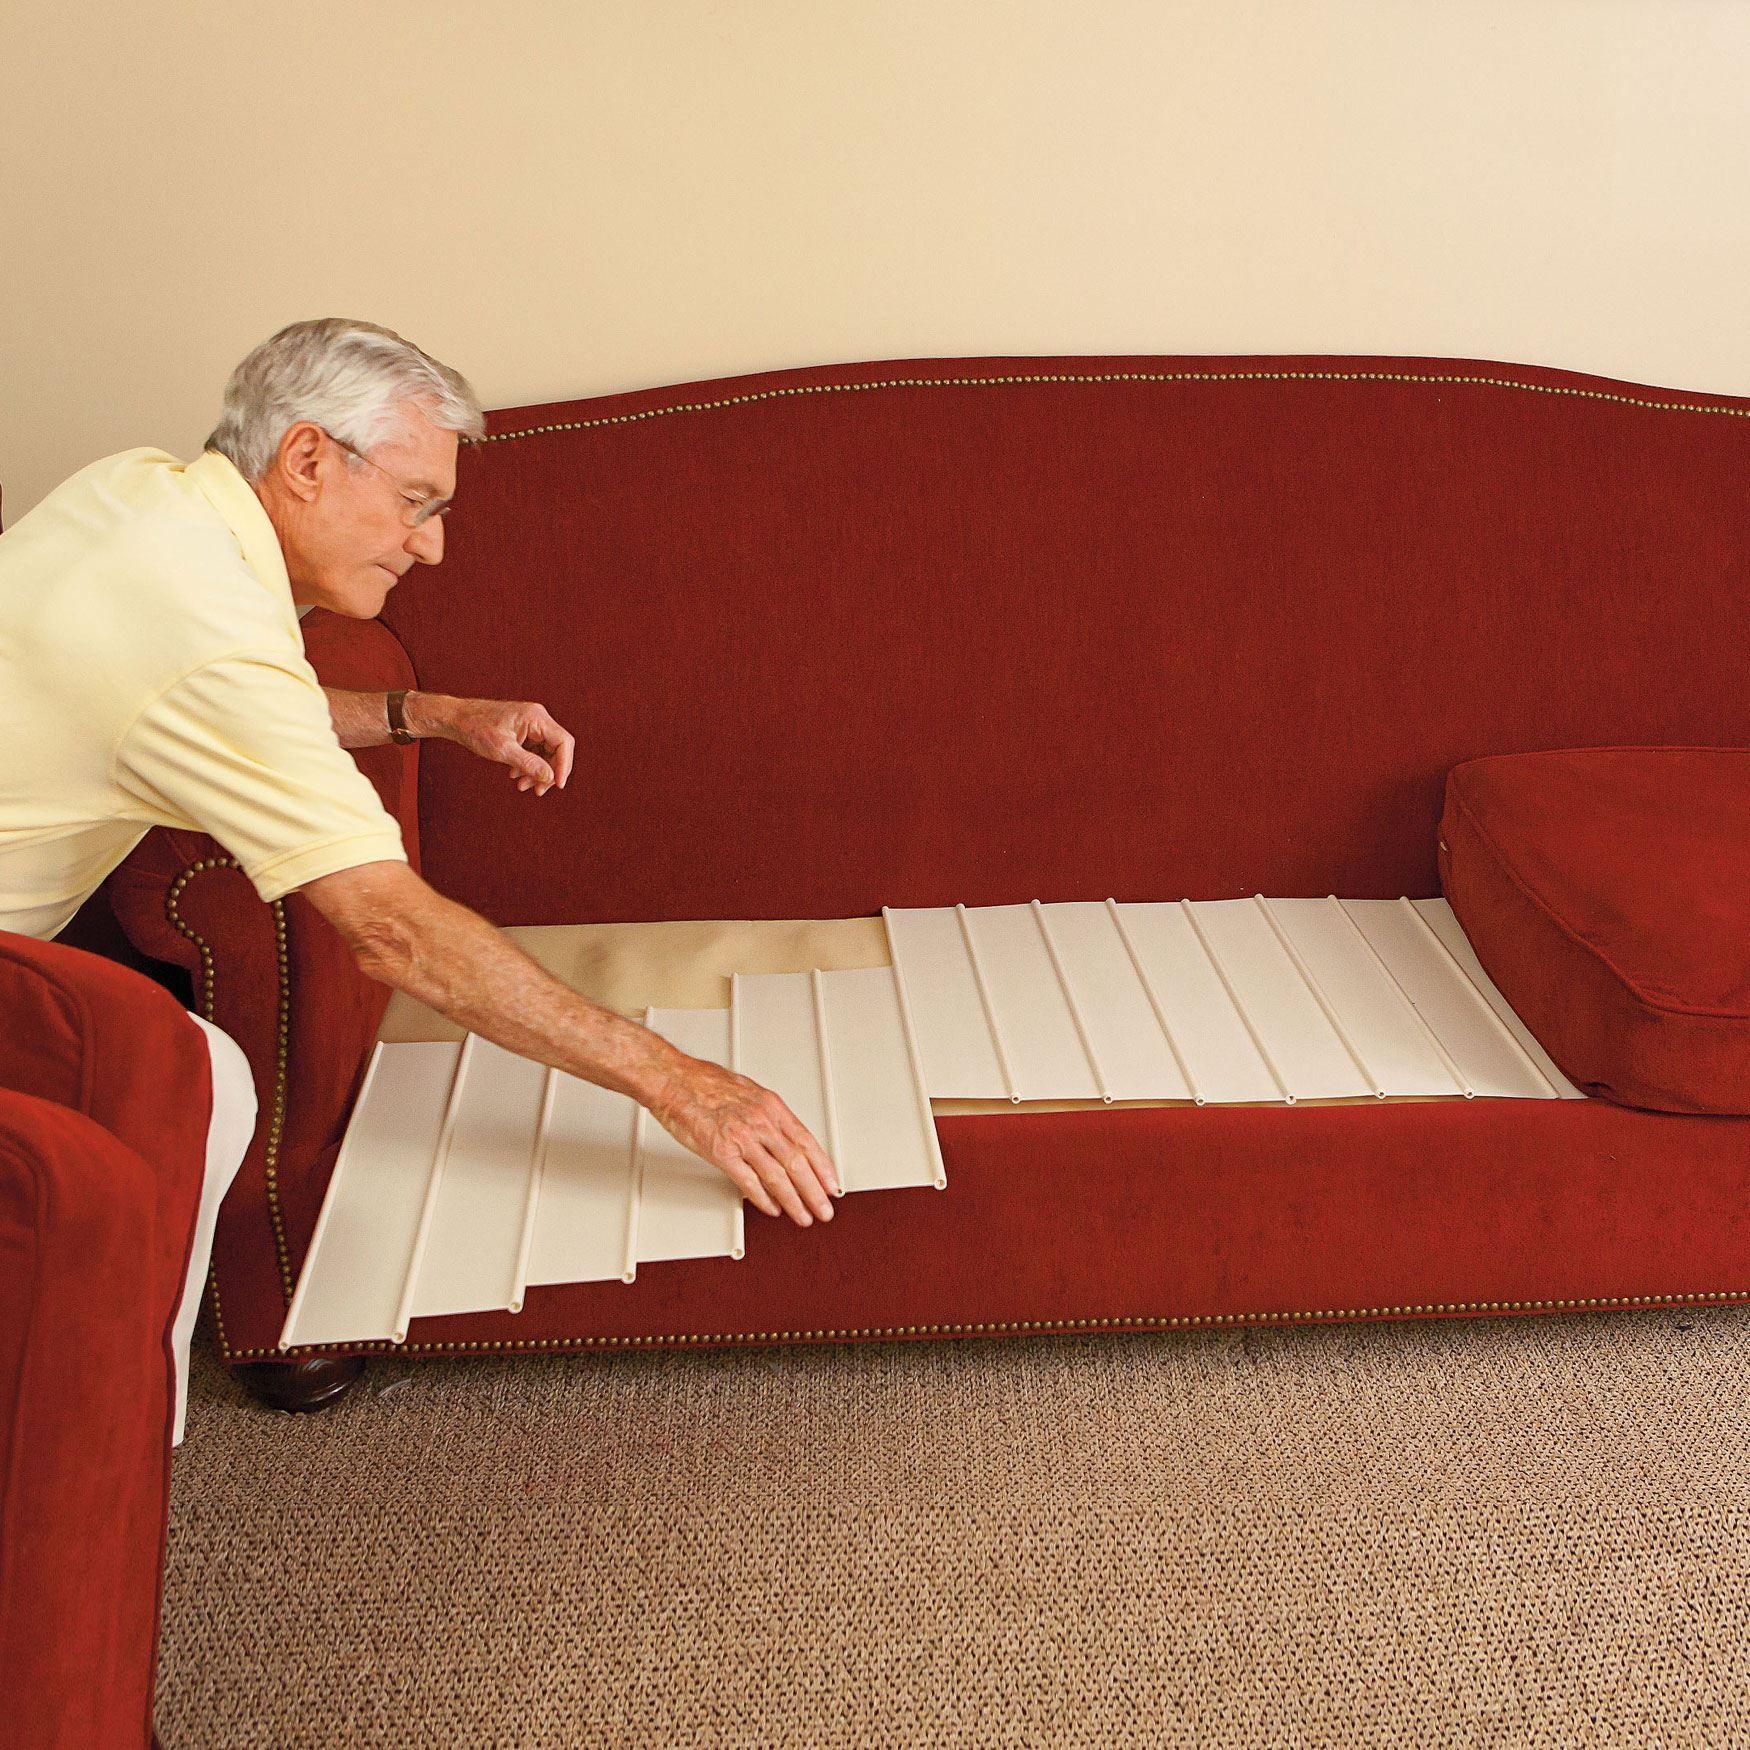 Furniture Fixera